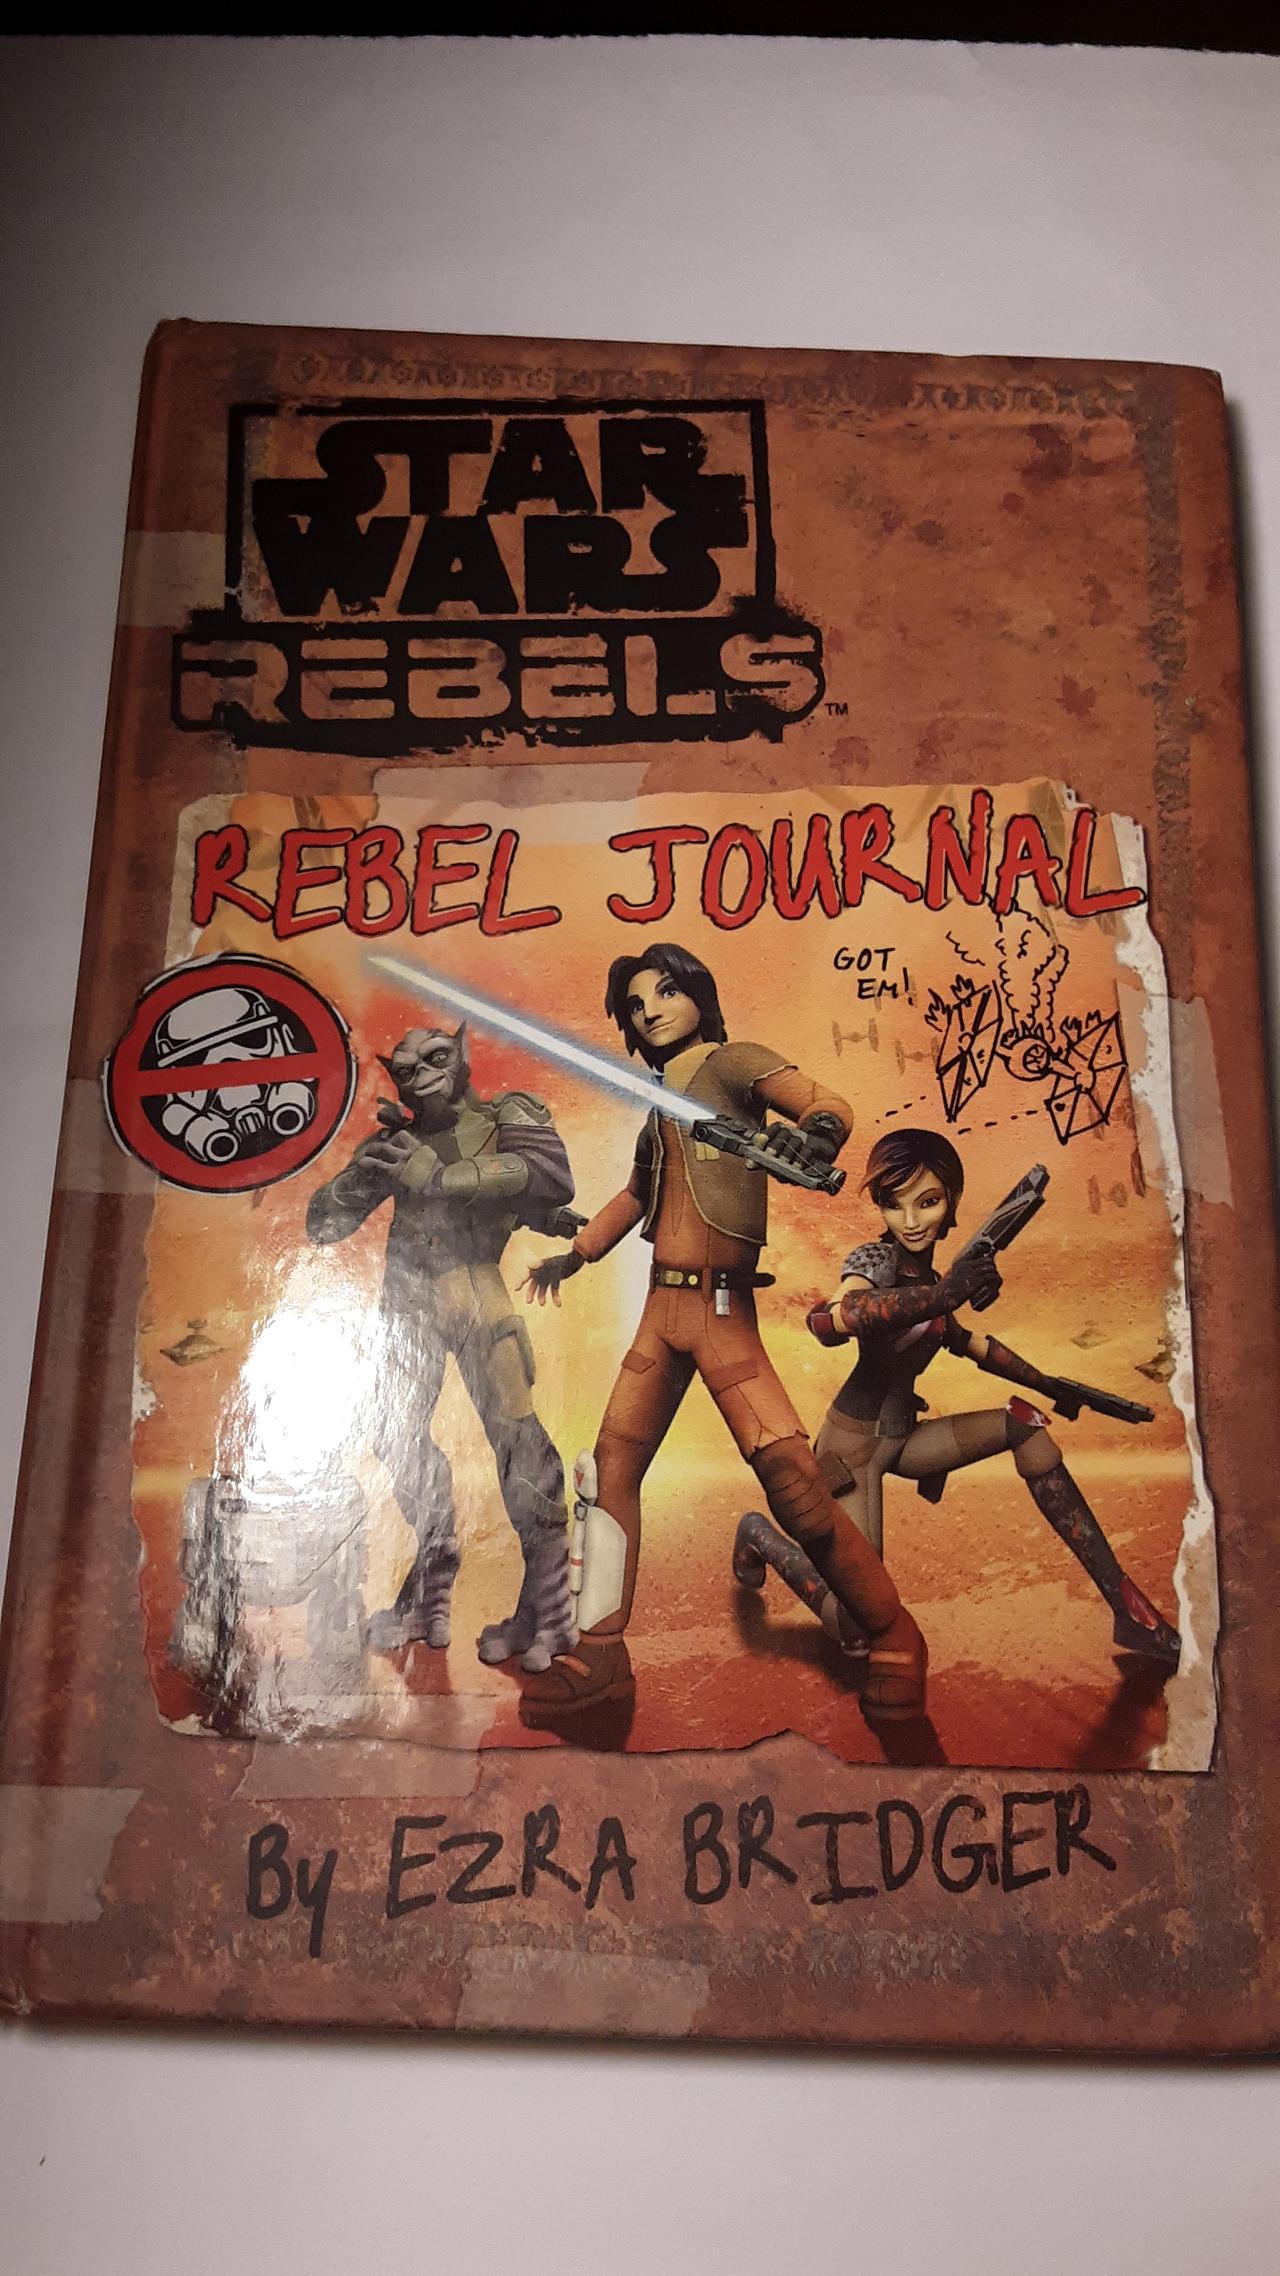 Rebel Journal by Ezra Bridger